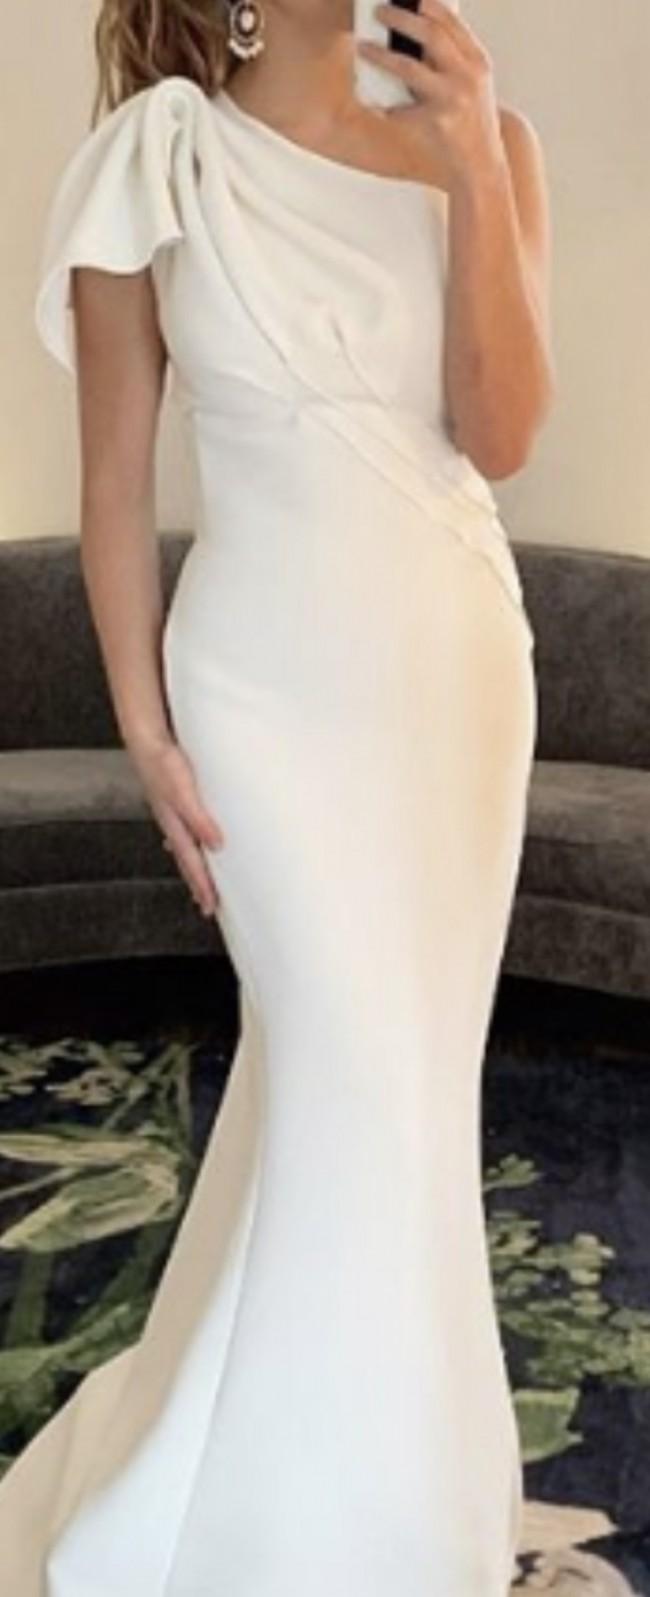 Toni Maticevski Accompany gown